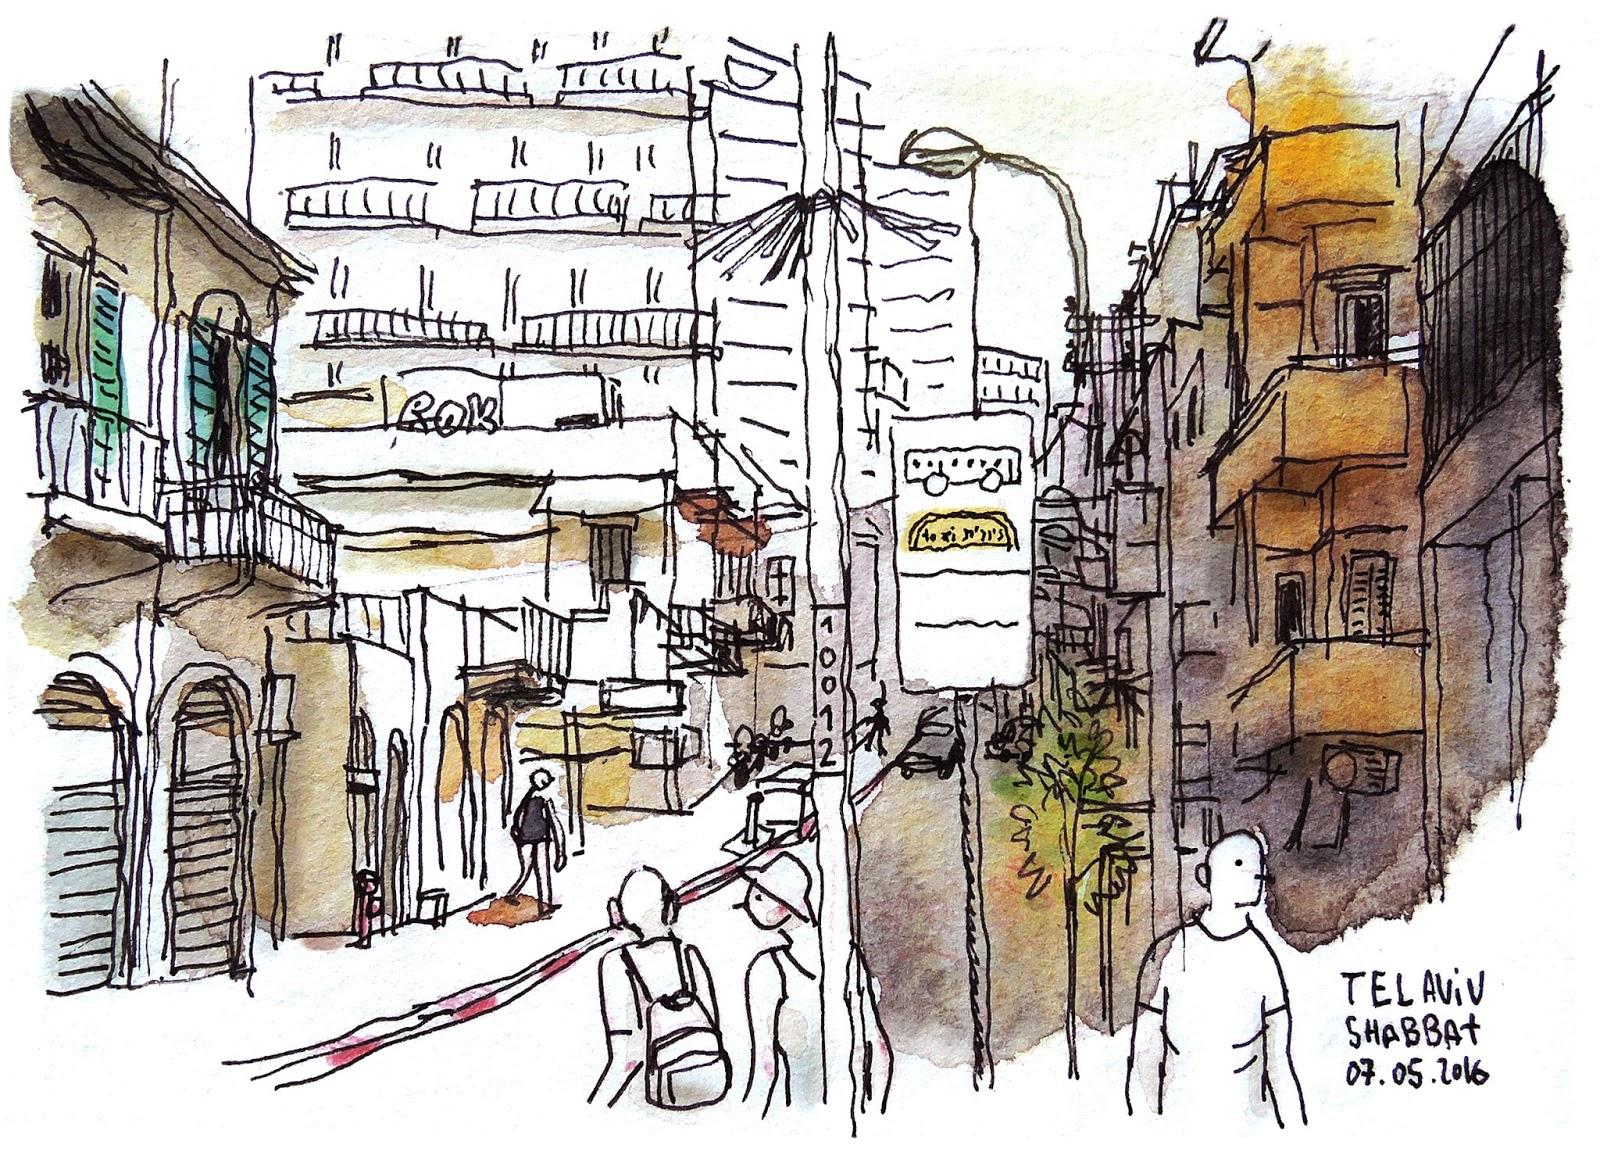 Vor Ort - Mainz Sketching Workshops | Urban Sketchers